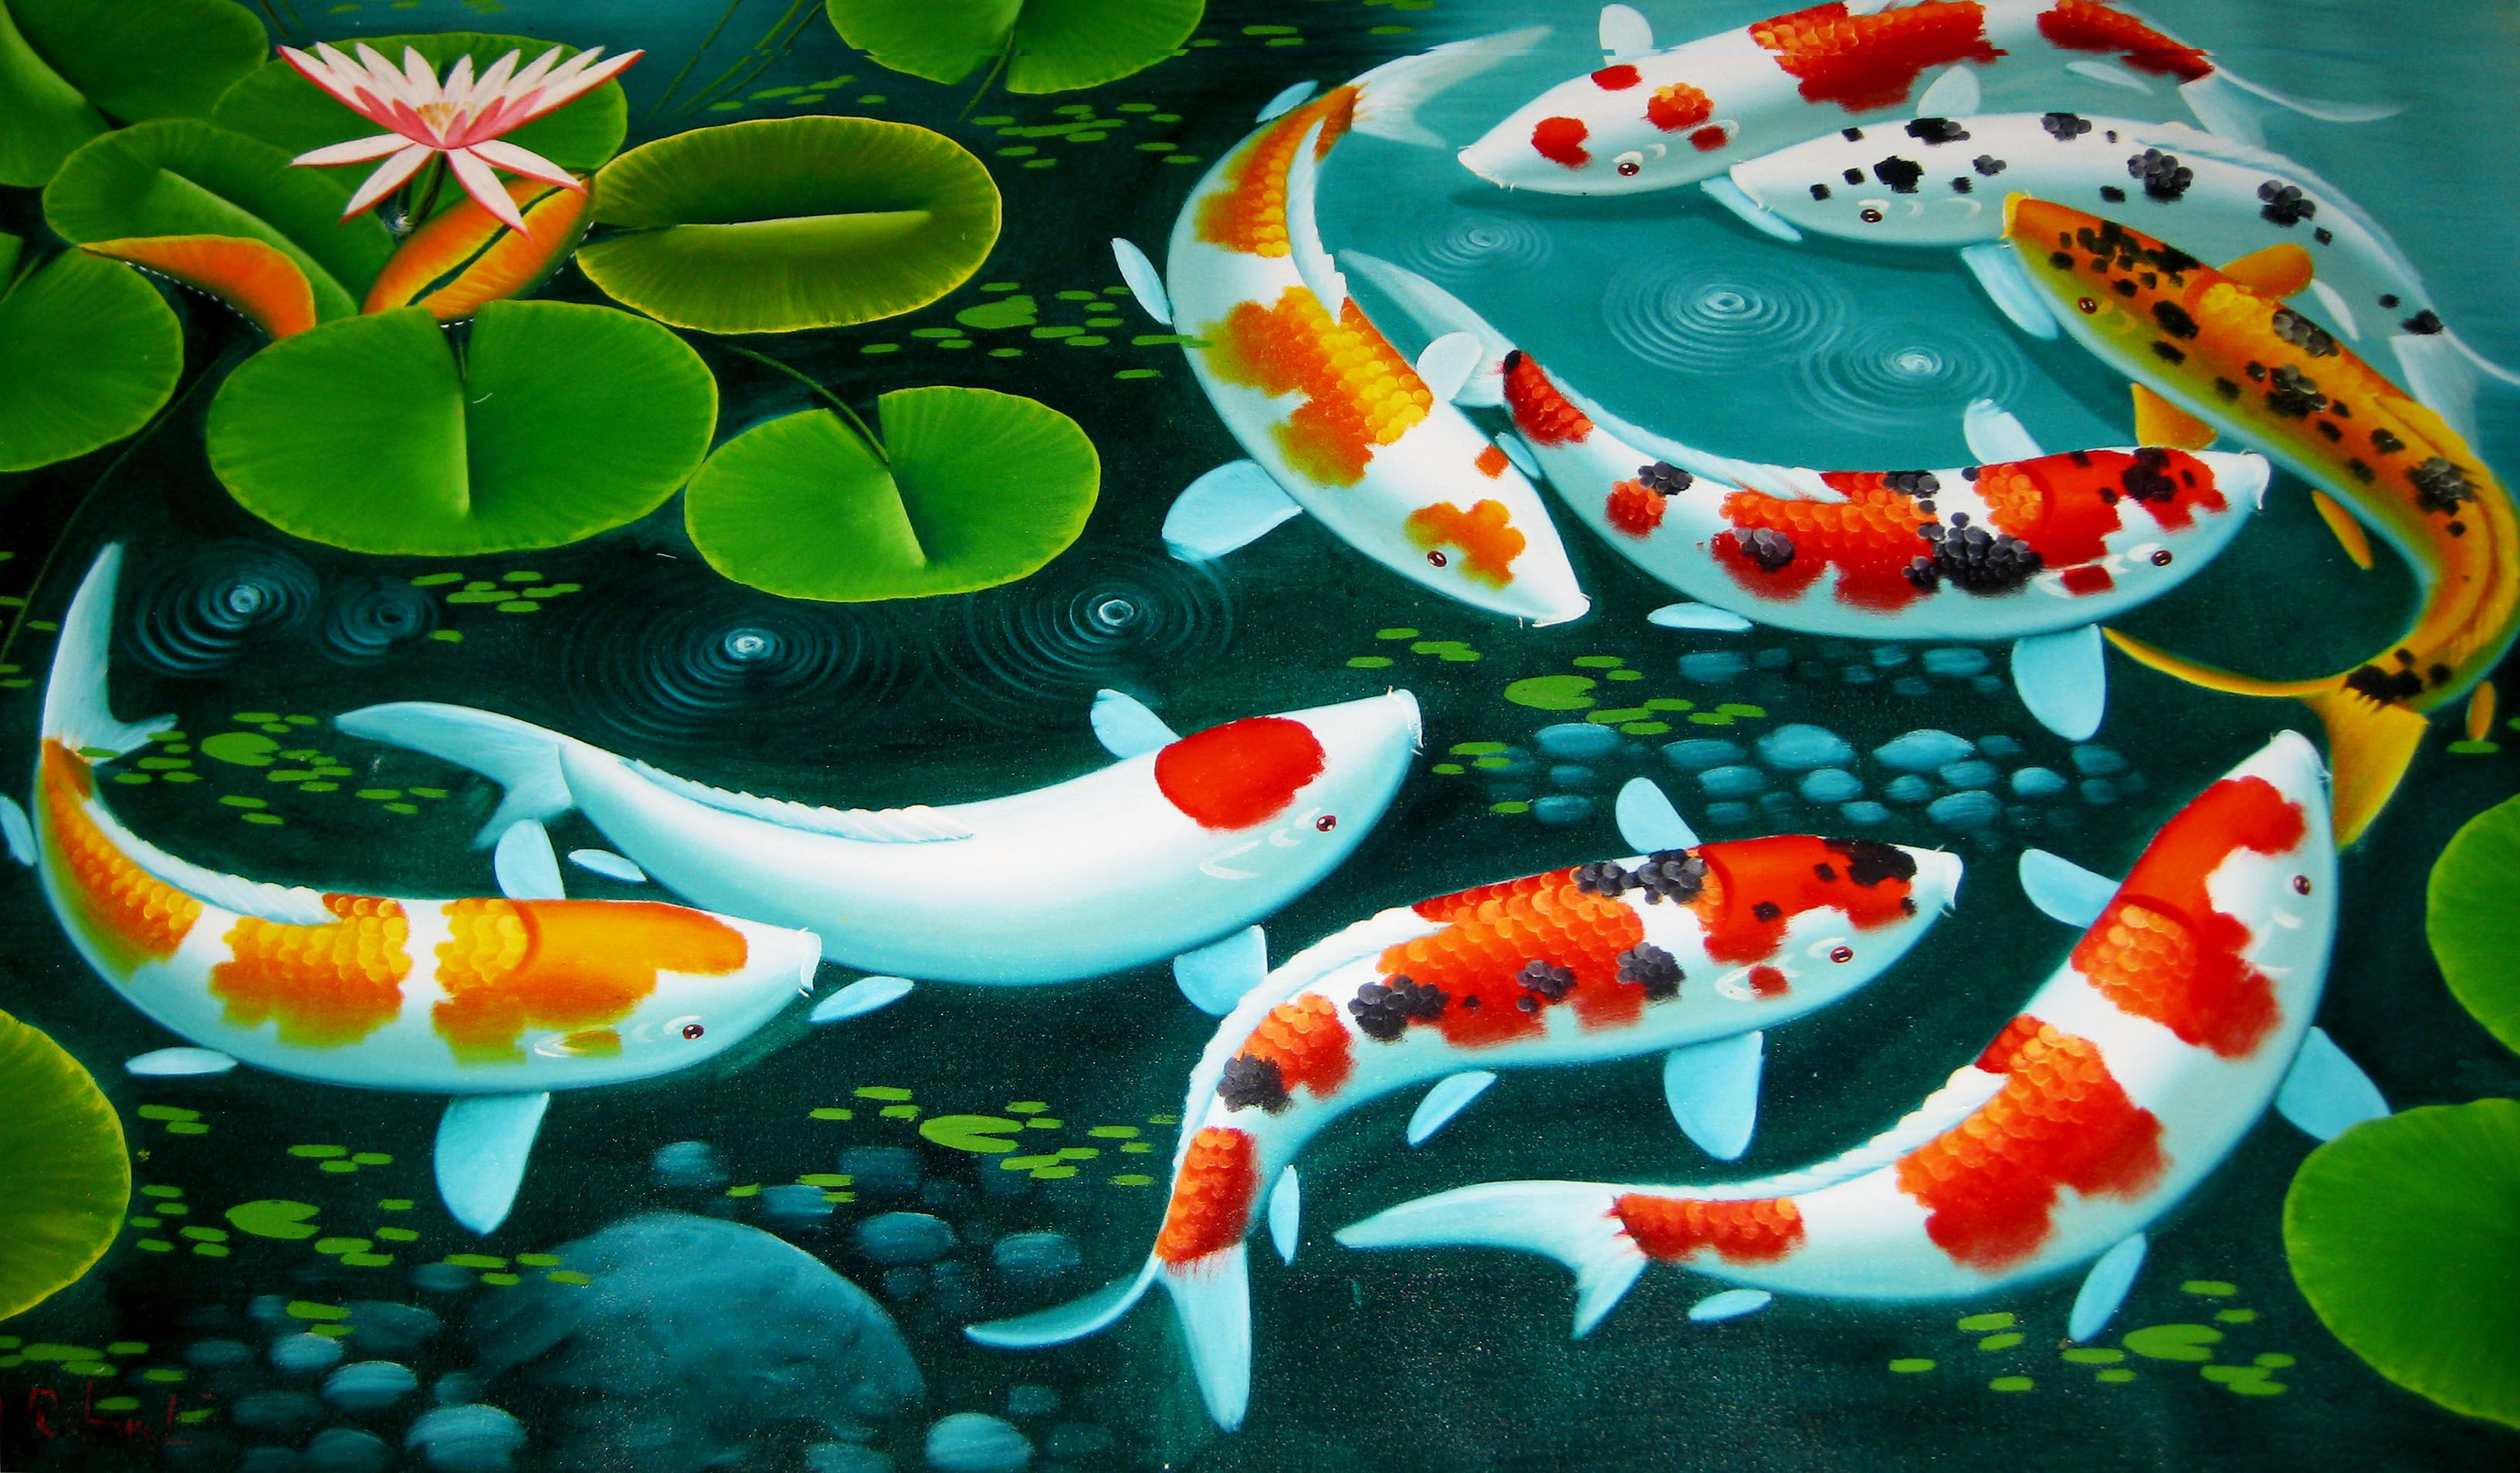 Pin Oleh Ari Di Art Ikan Gambar Lukisan